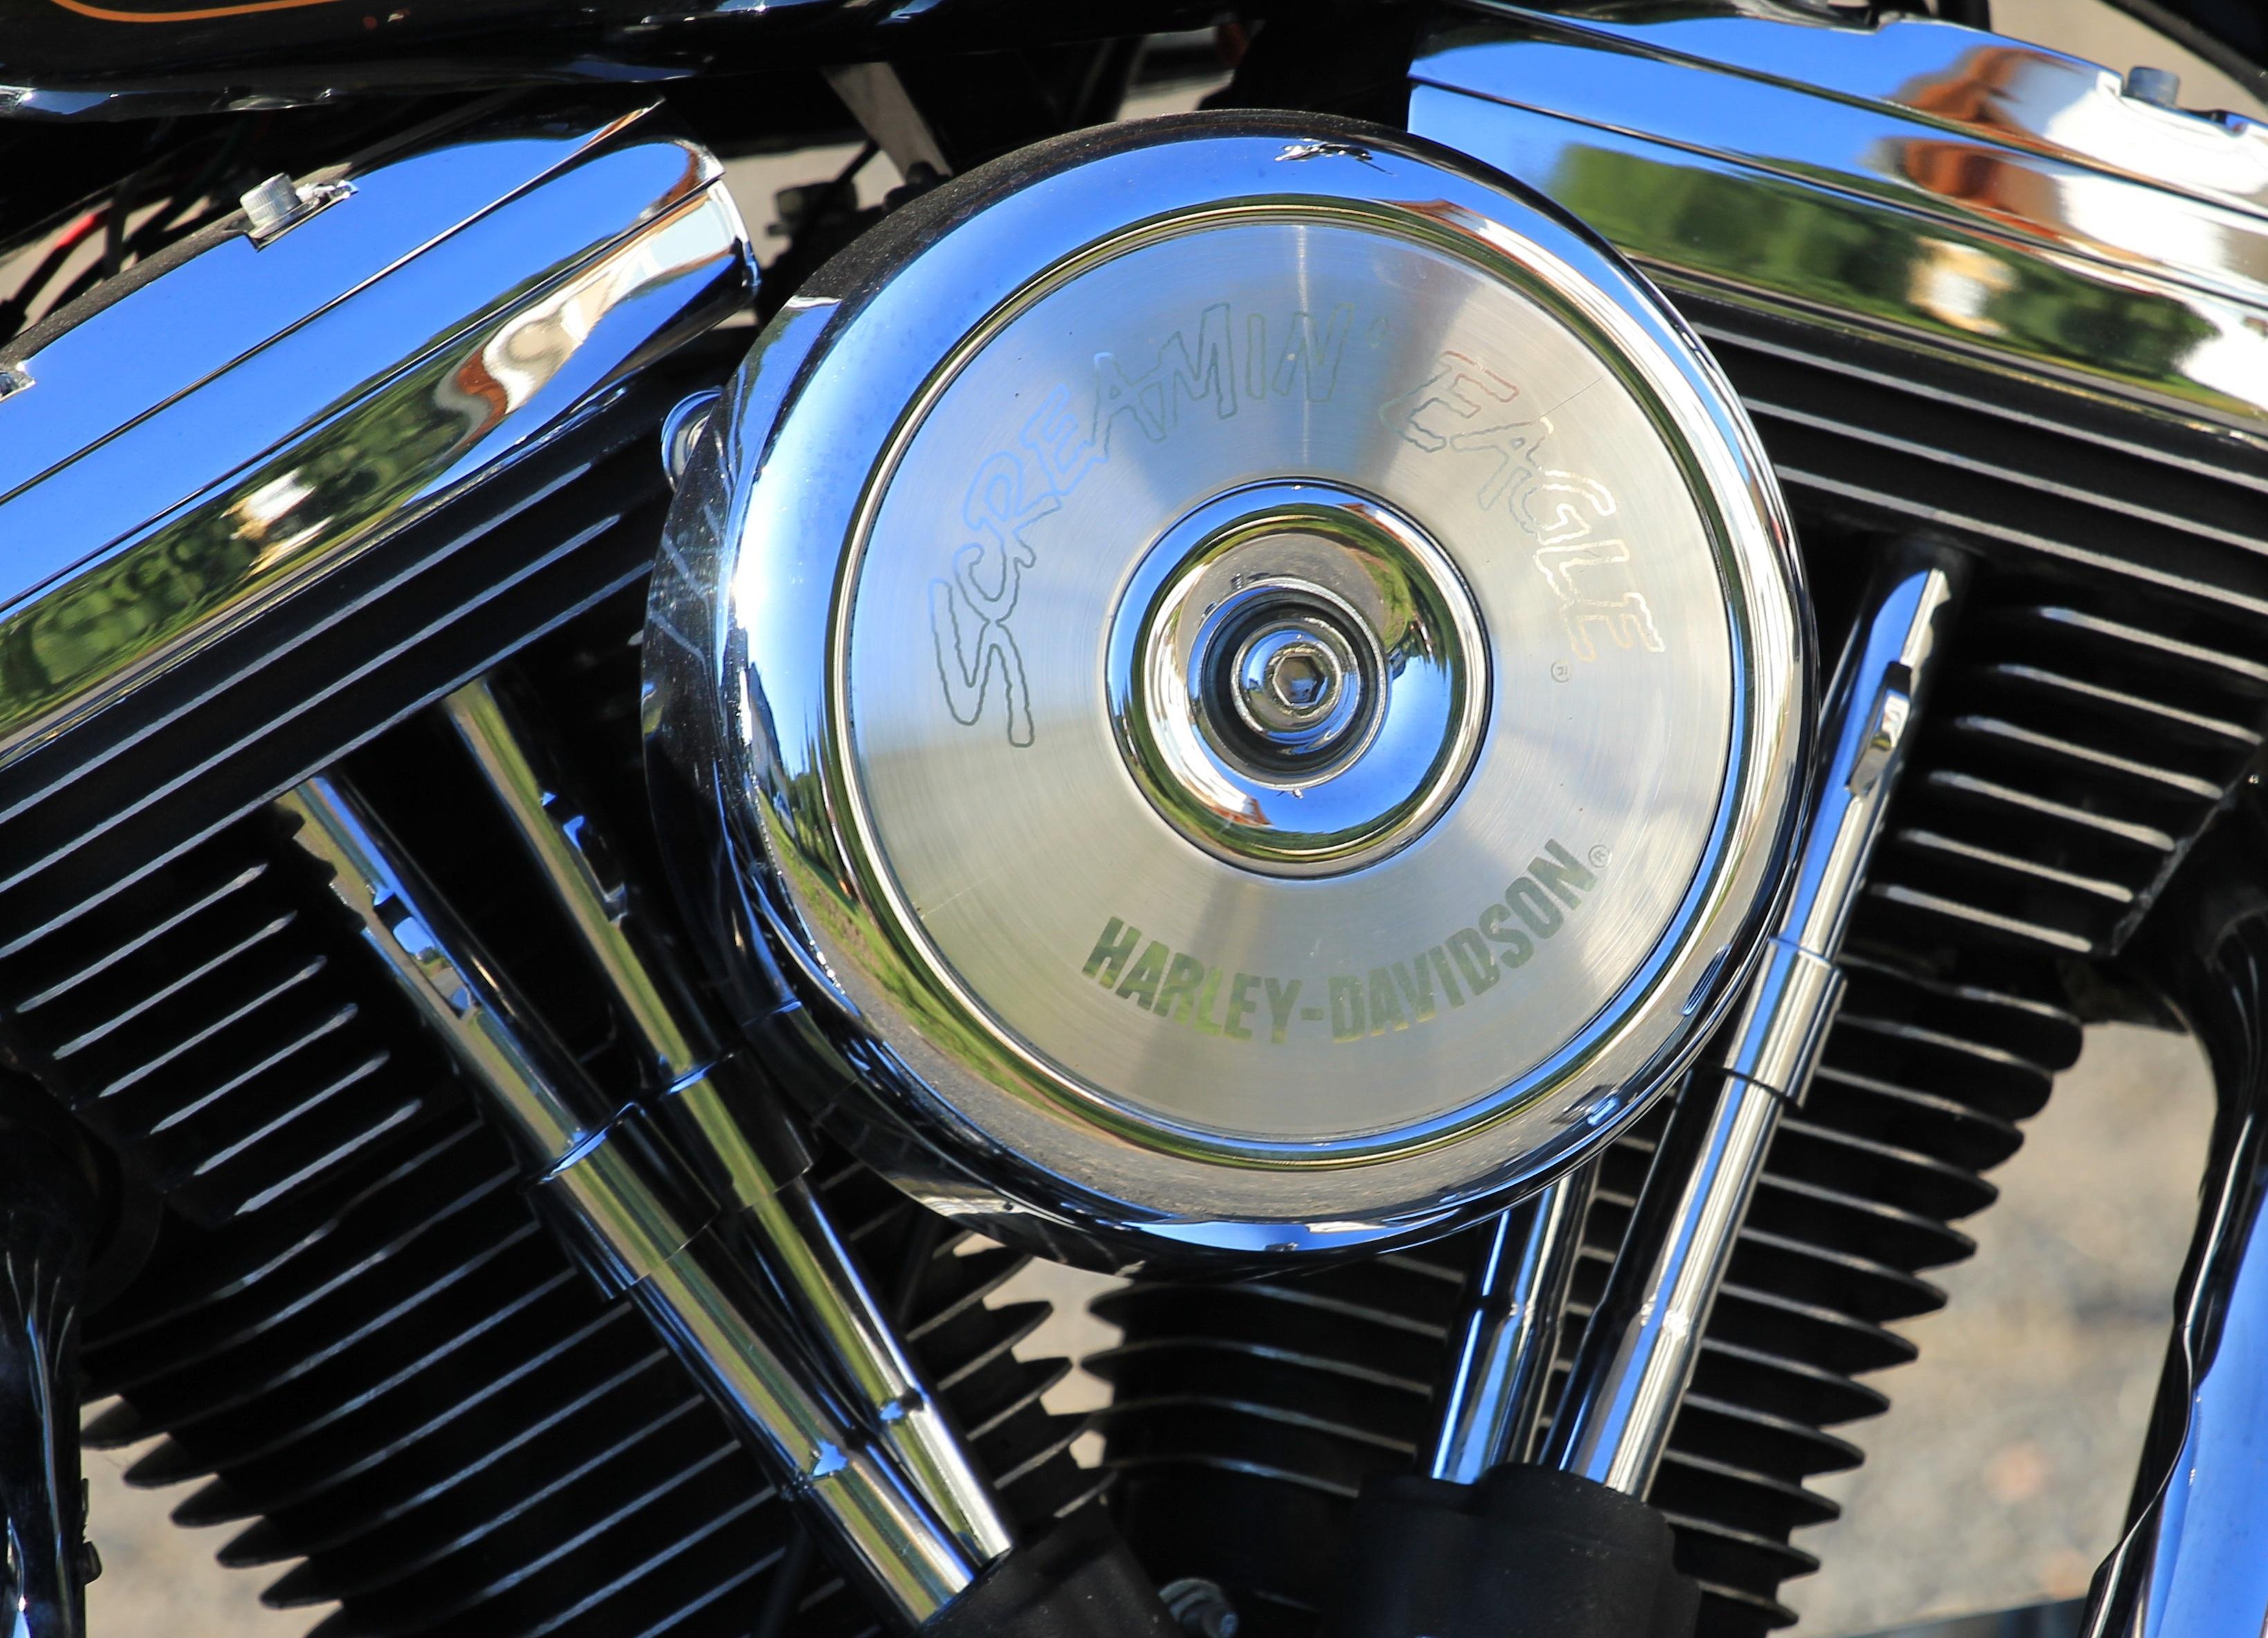 kostenlose foto rad fahrzeug motorrad metall usa freiheit kraftfahrzeug oldtimer chrom. Black Bedroom Furniture Sets. Home Design Ideas